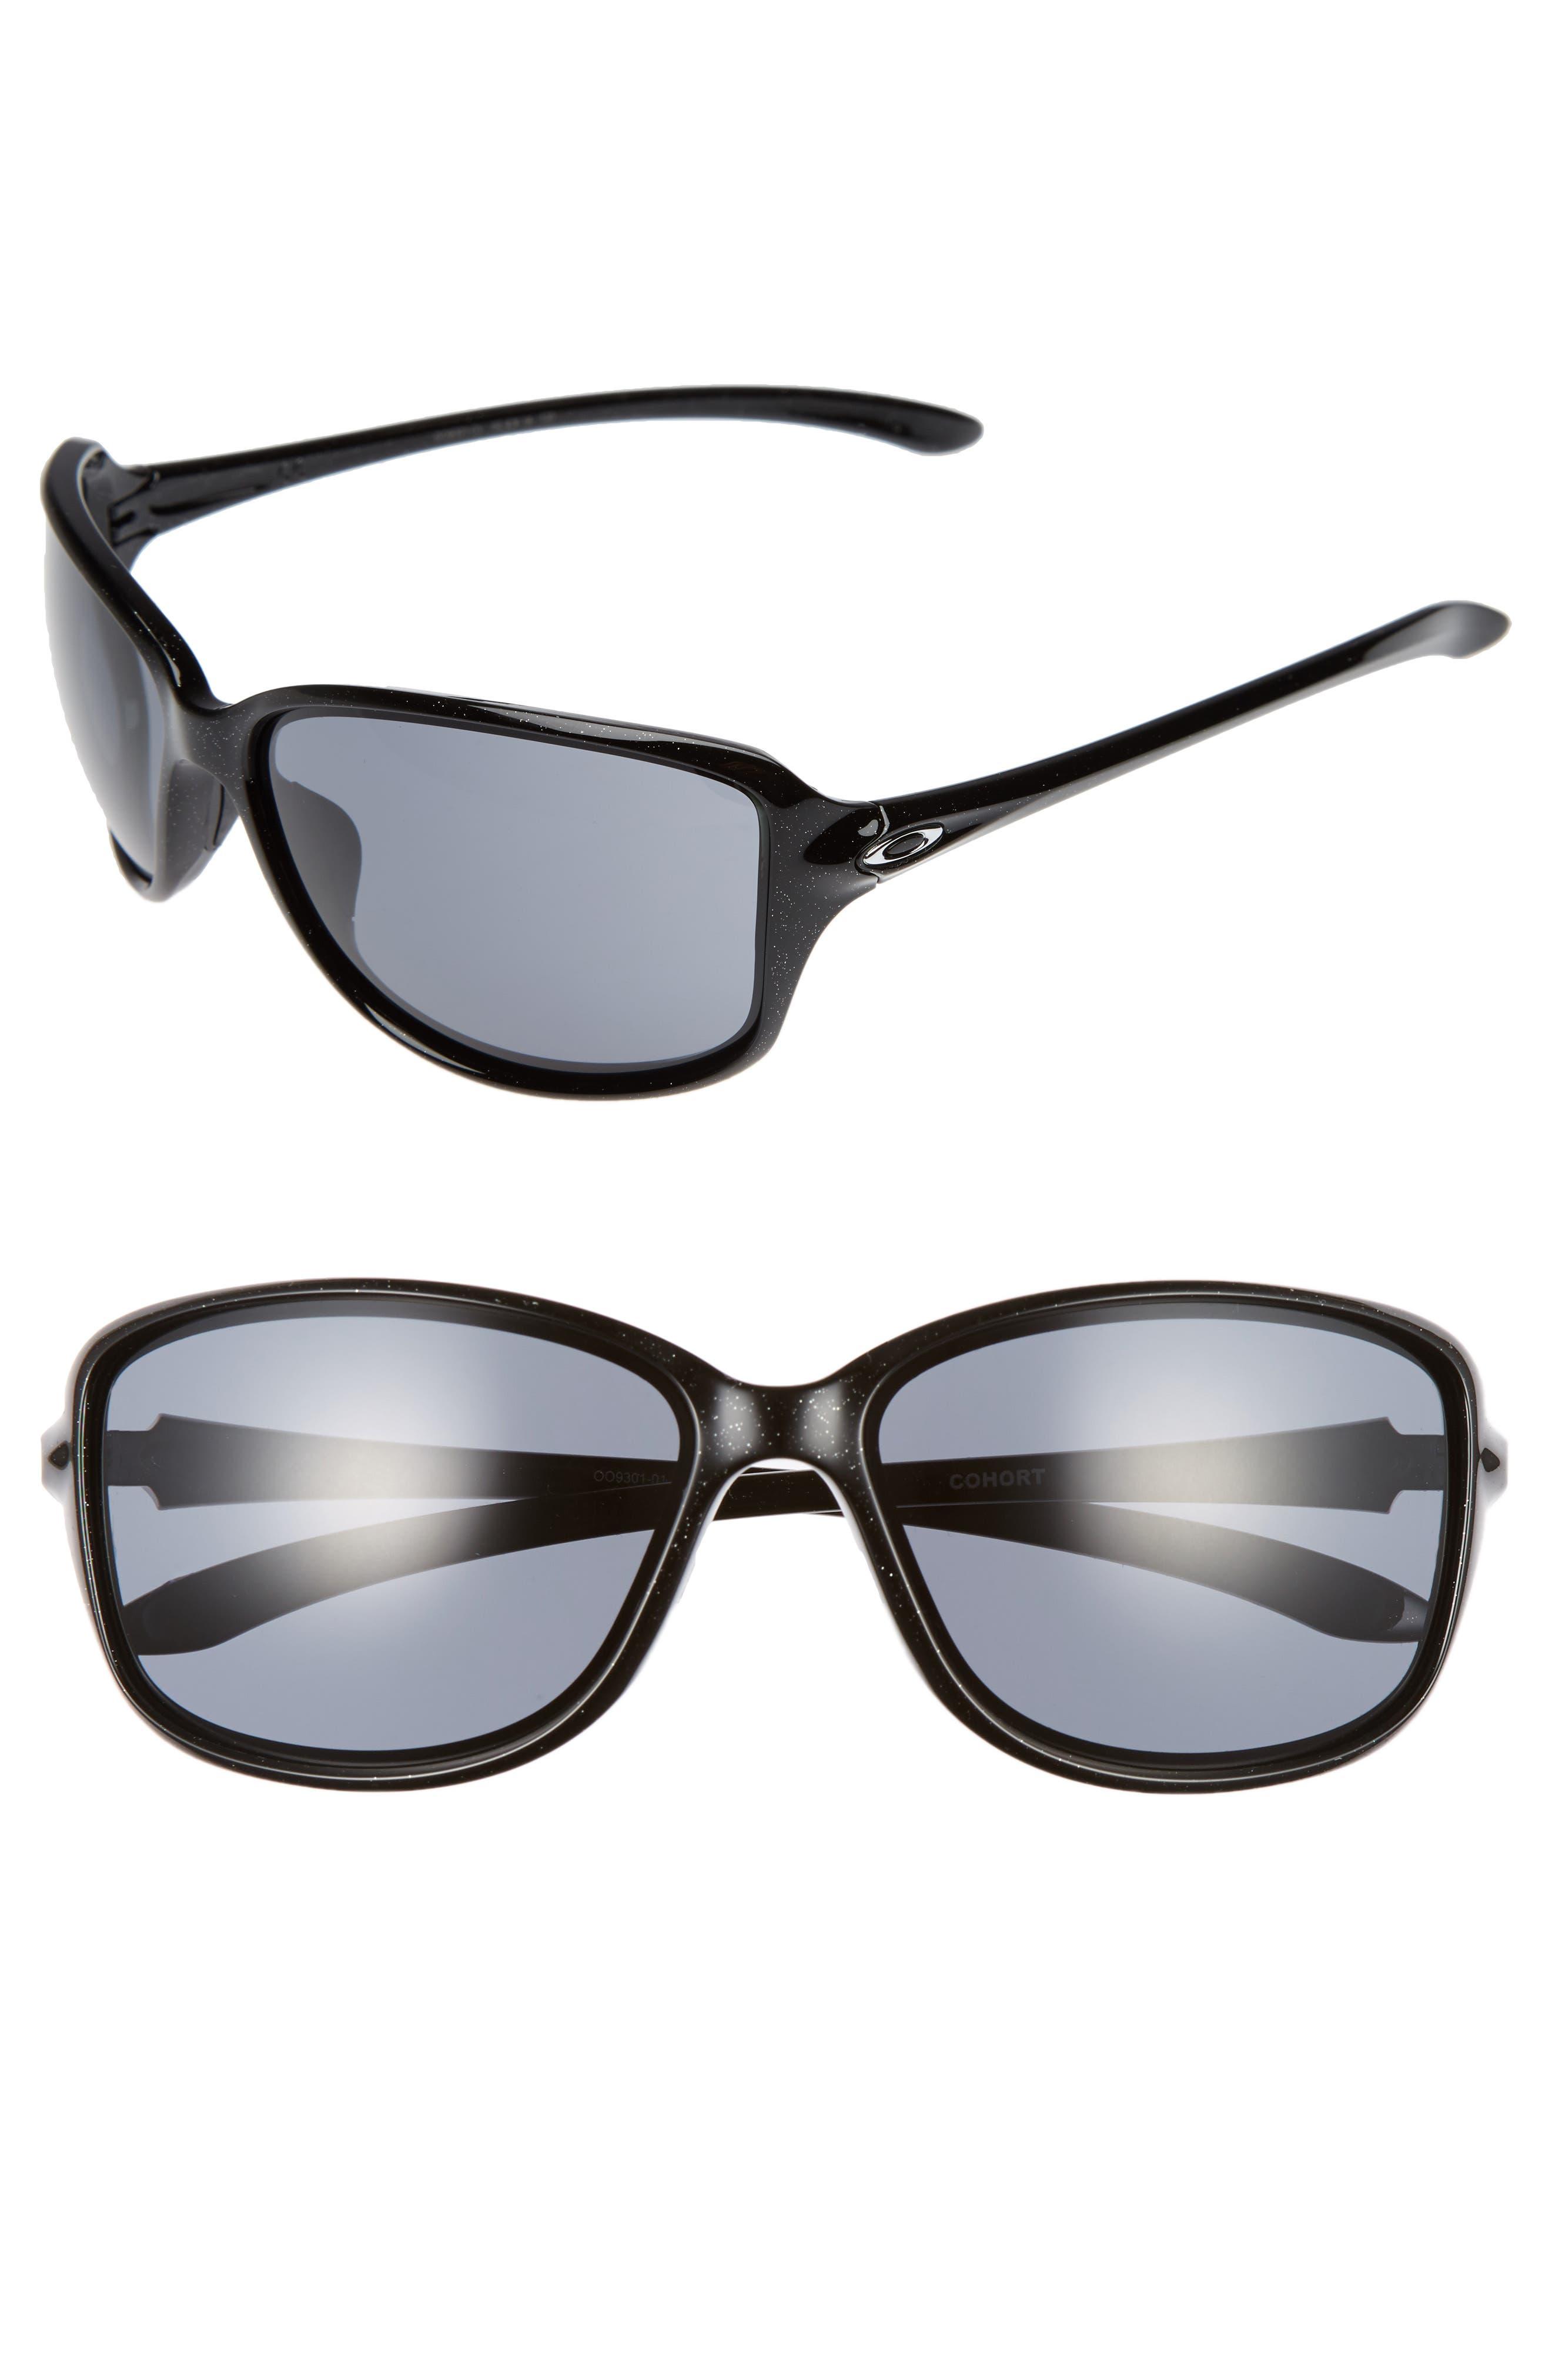 Cohort 62mm Sunglasses,                             Main thumbnail 1, color,                             Metallic Black/ Grey